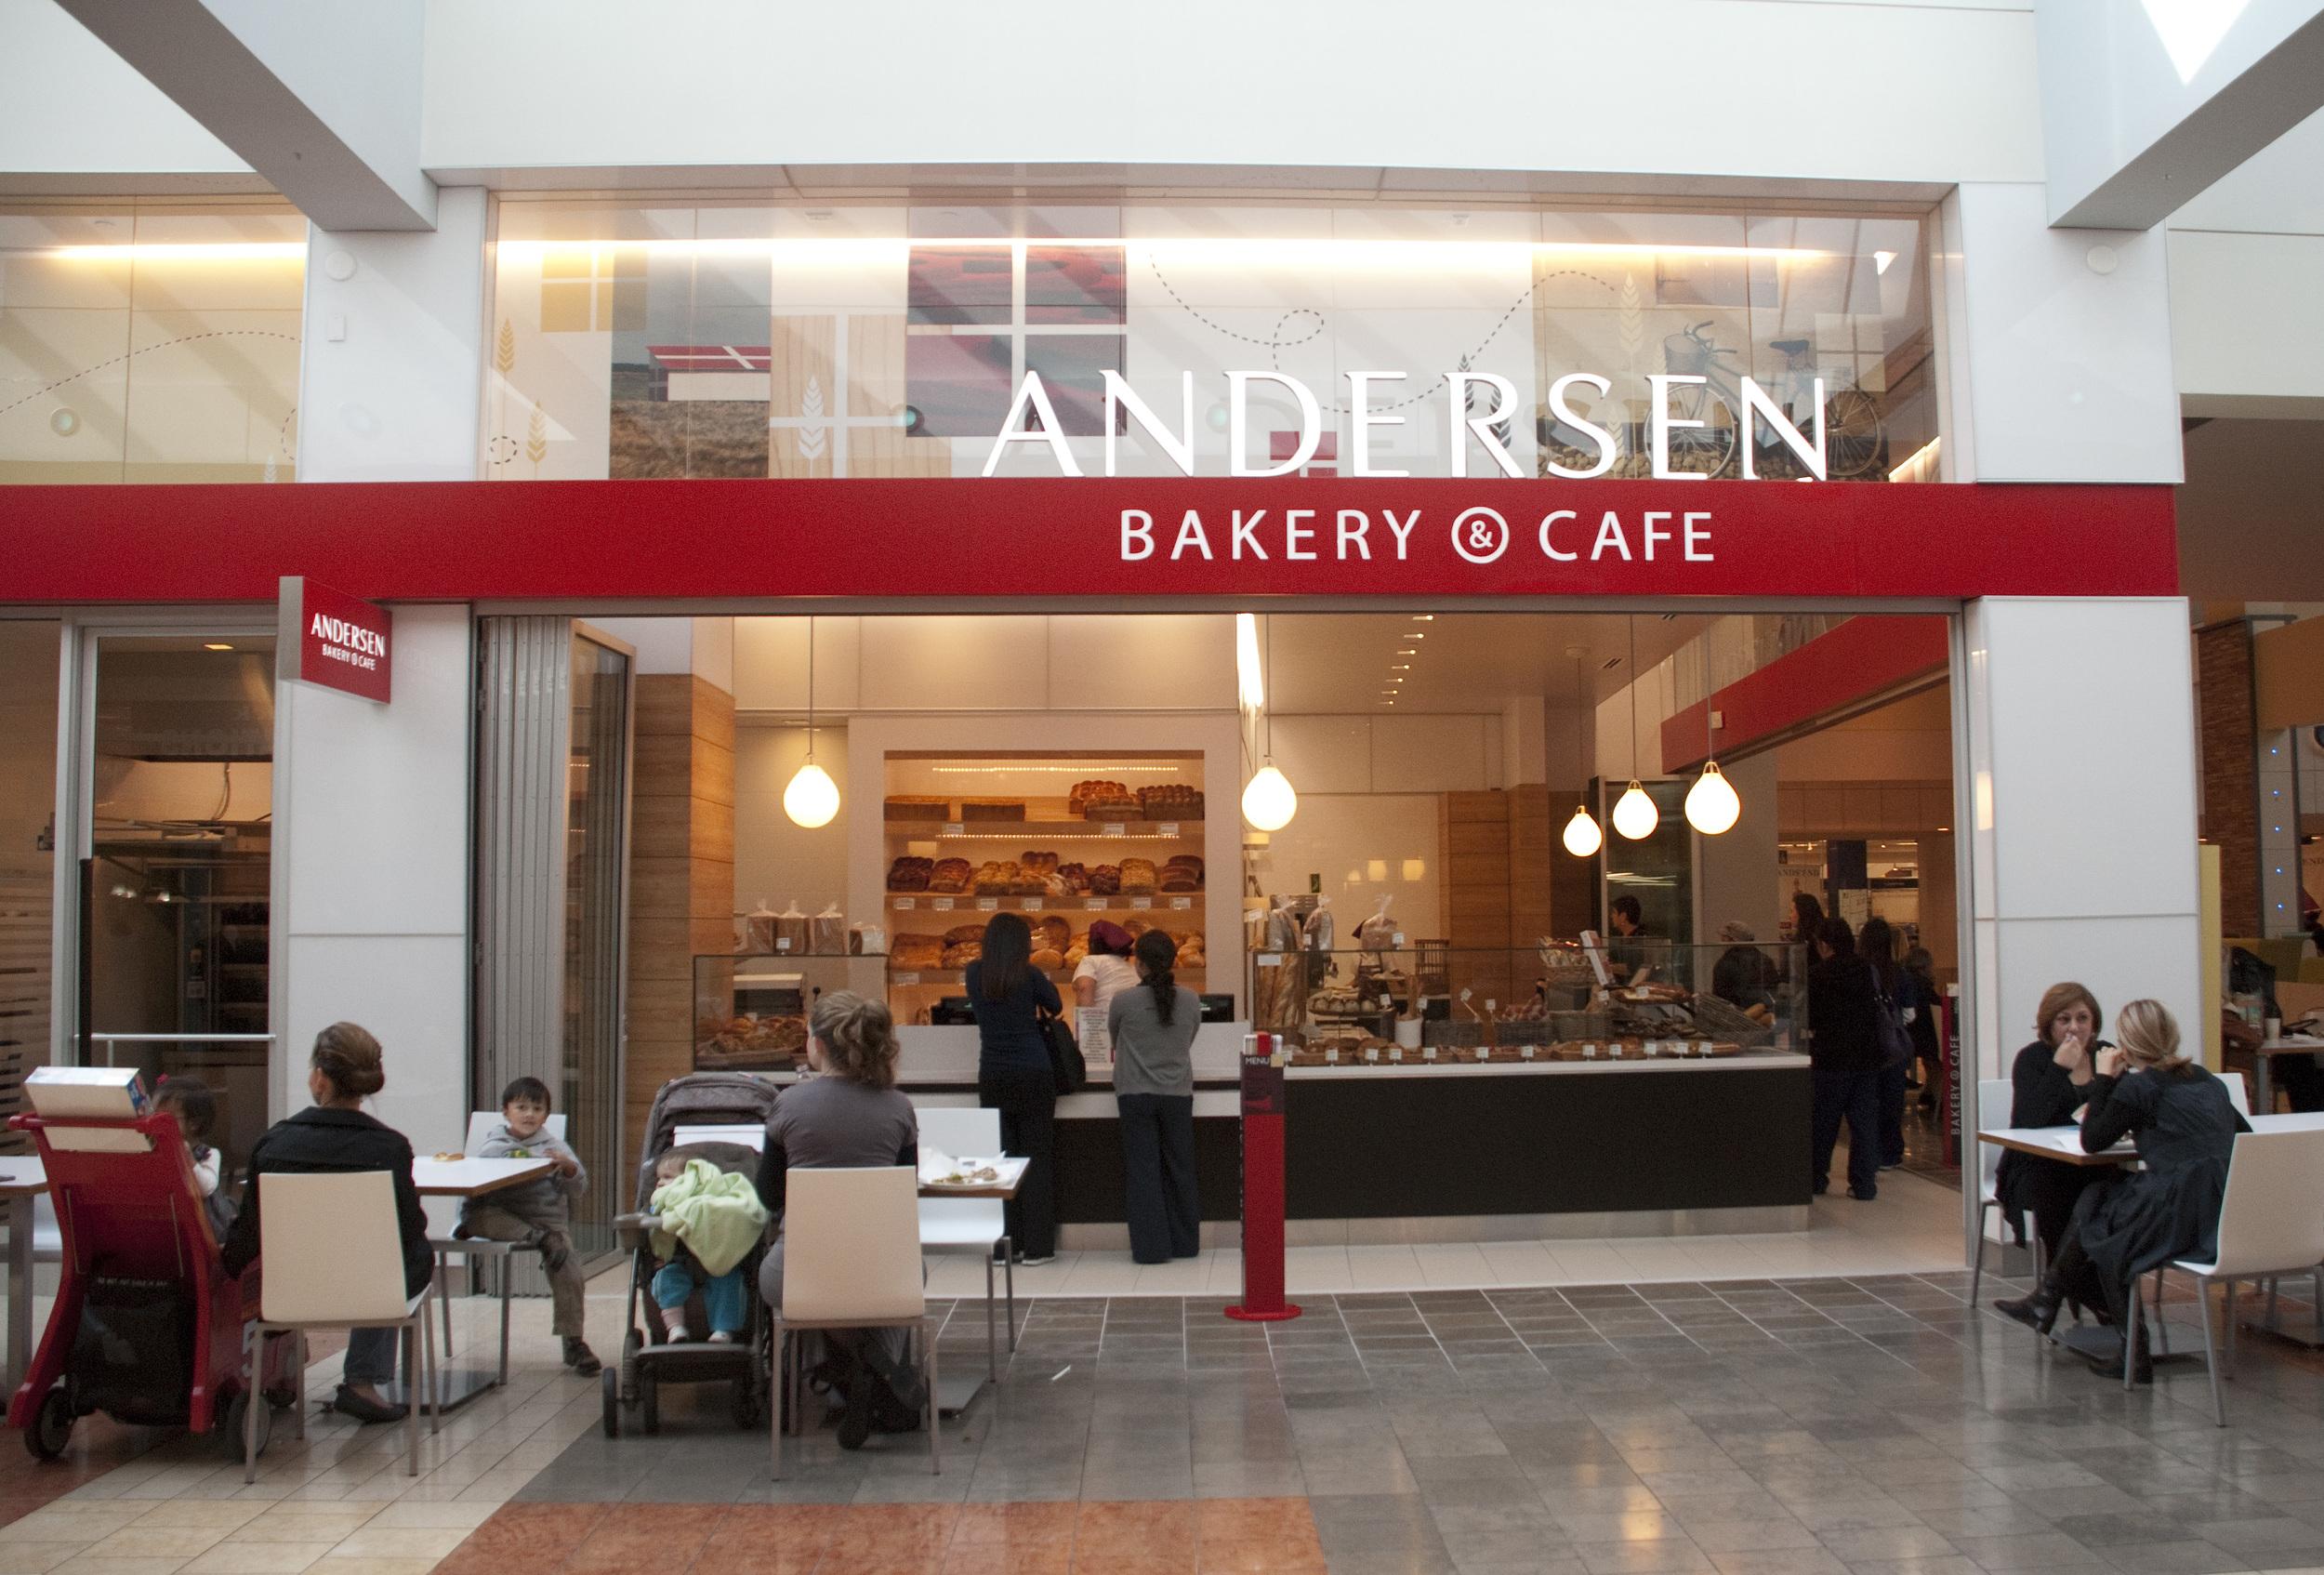 Andersen Bakery & Cafe